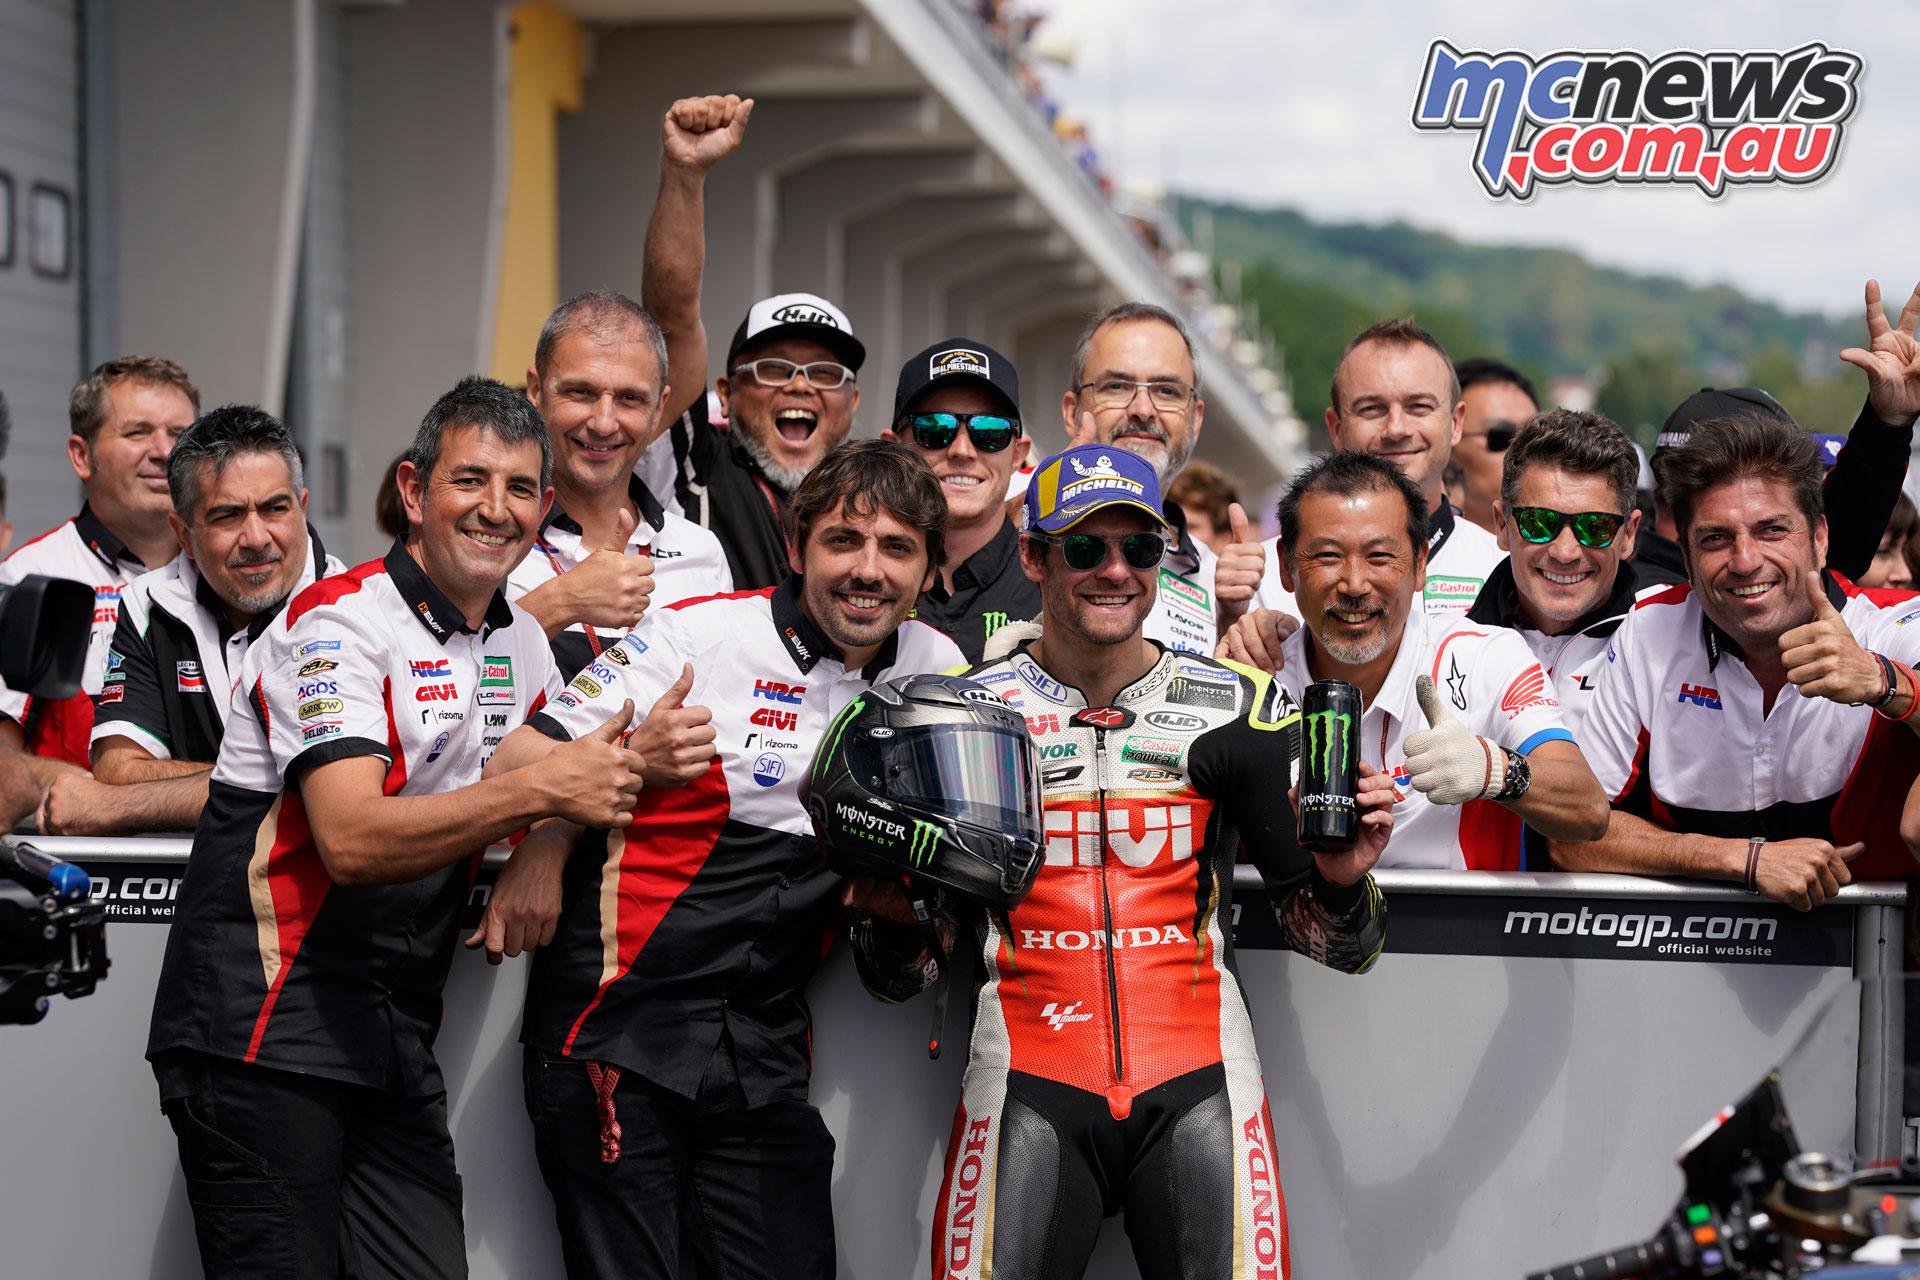 MotoGP Rnd Sachsenring Germany Cal Crutchlow AX